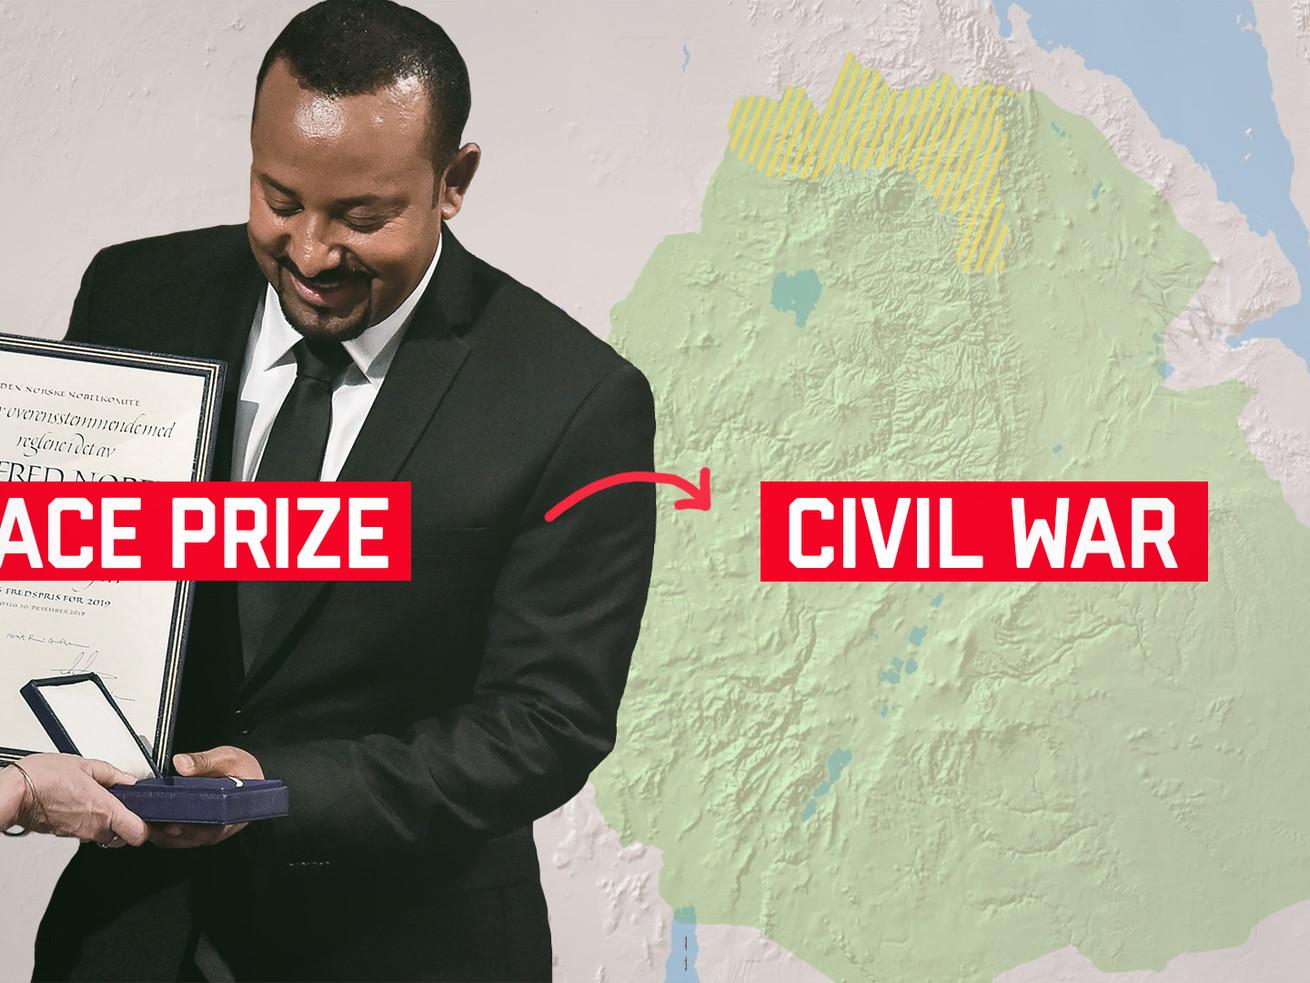 Why Ethiopia is invading itself